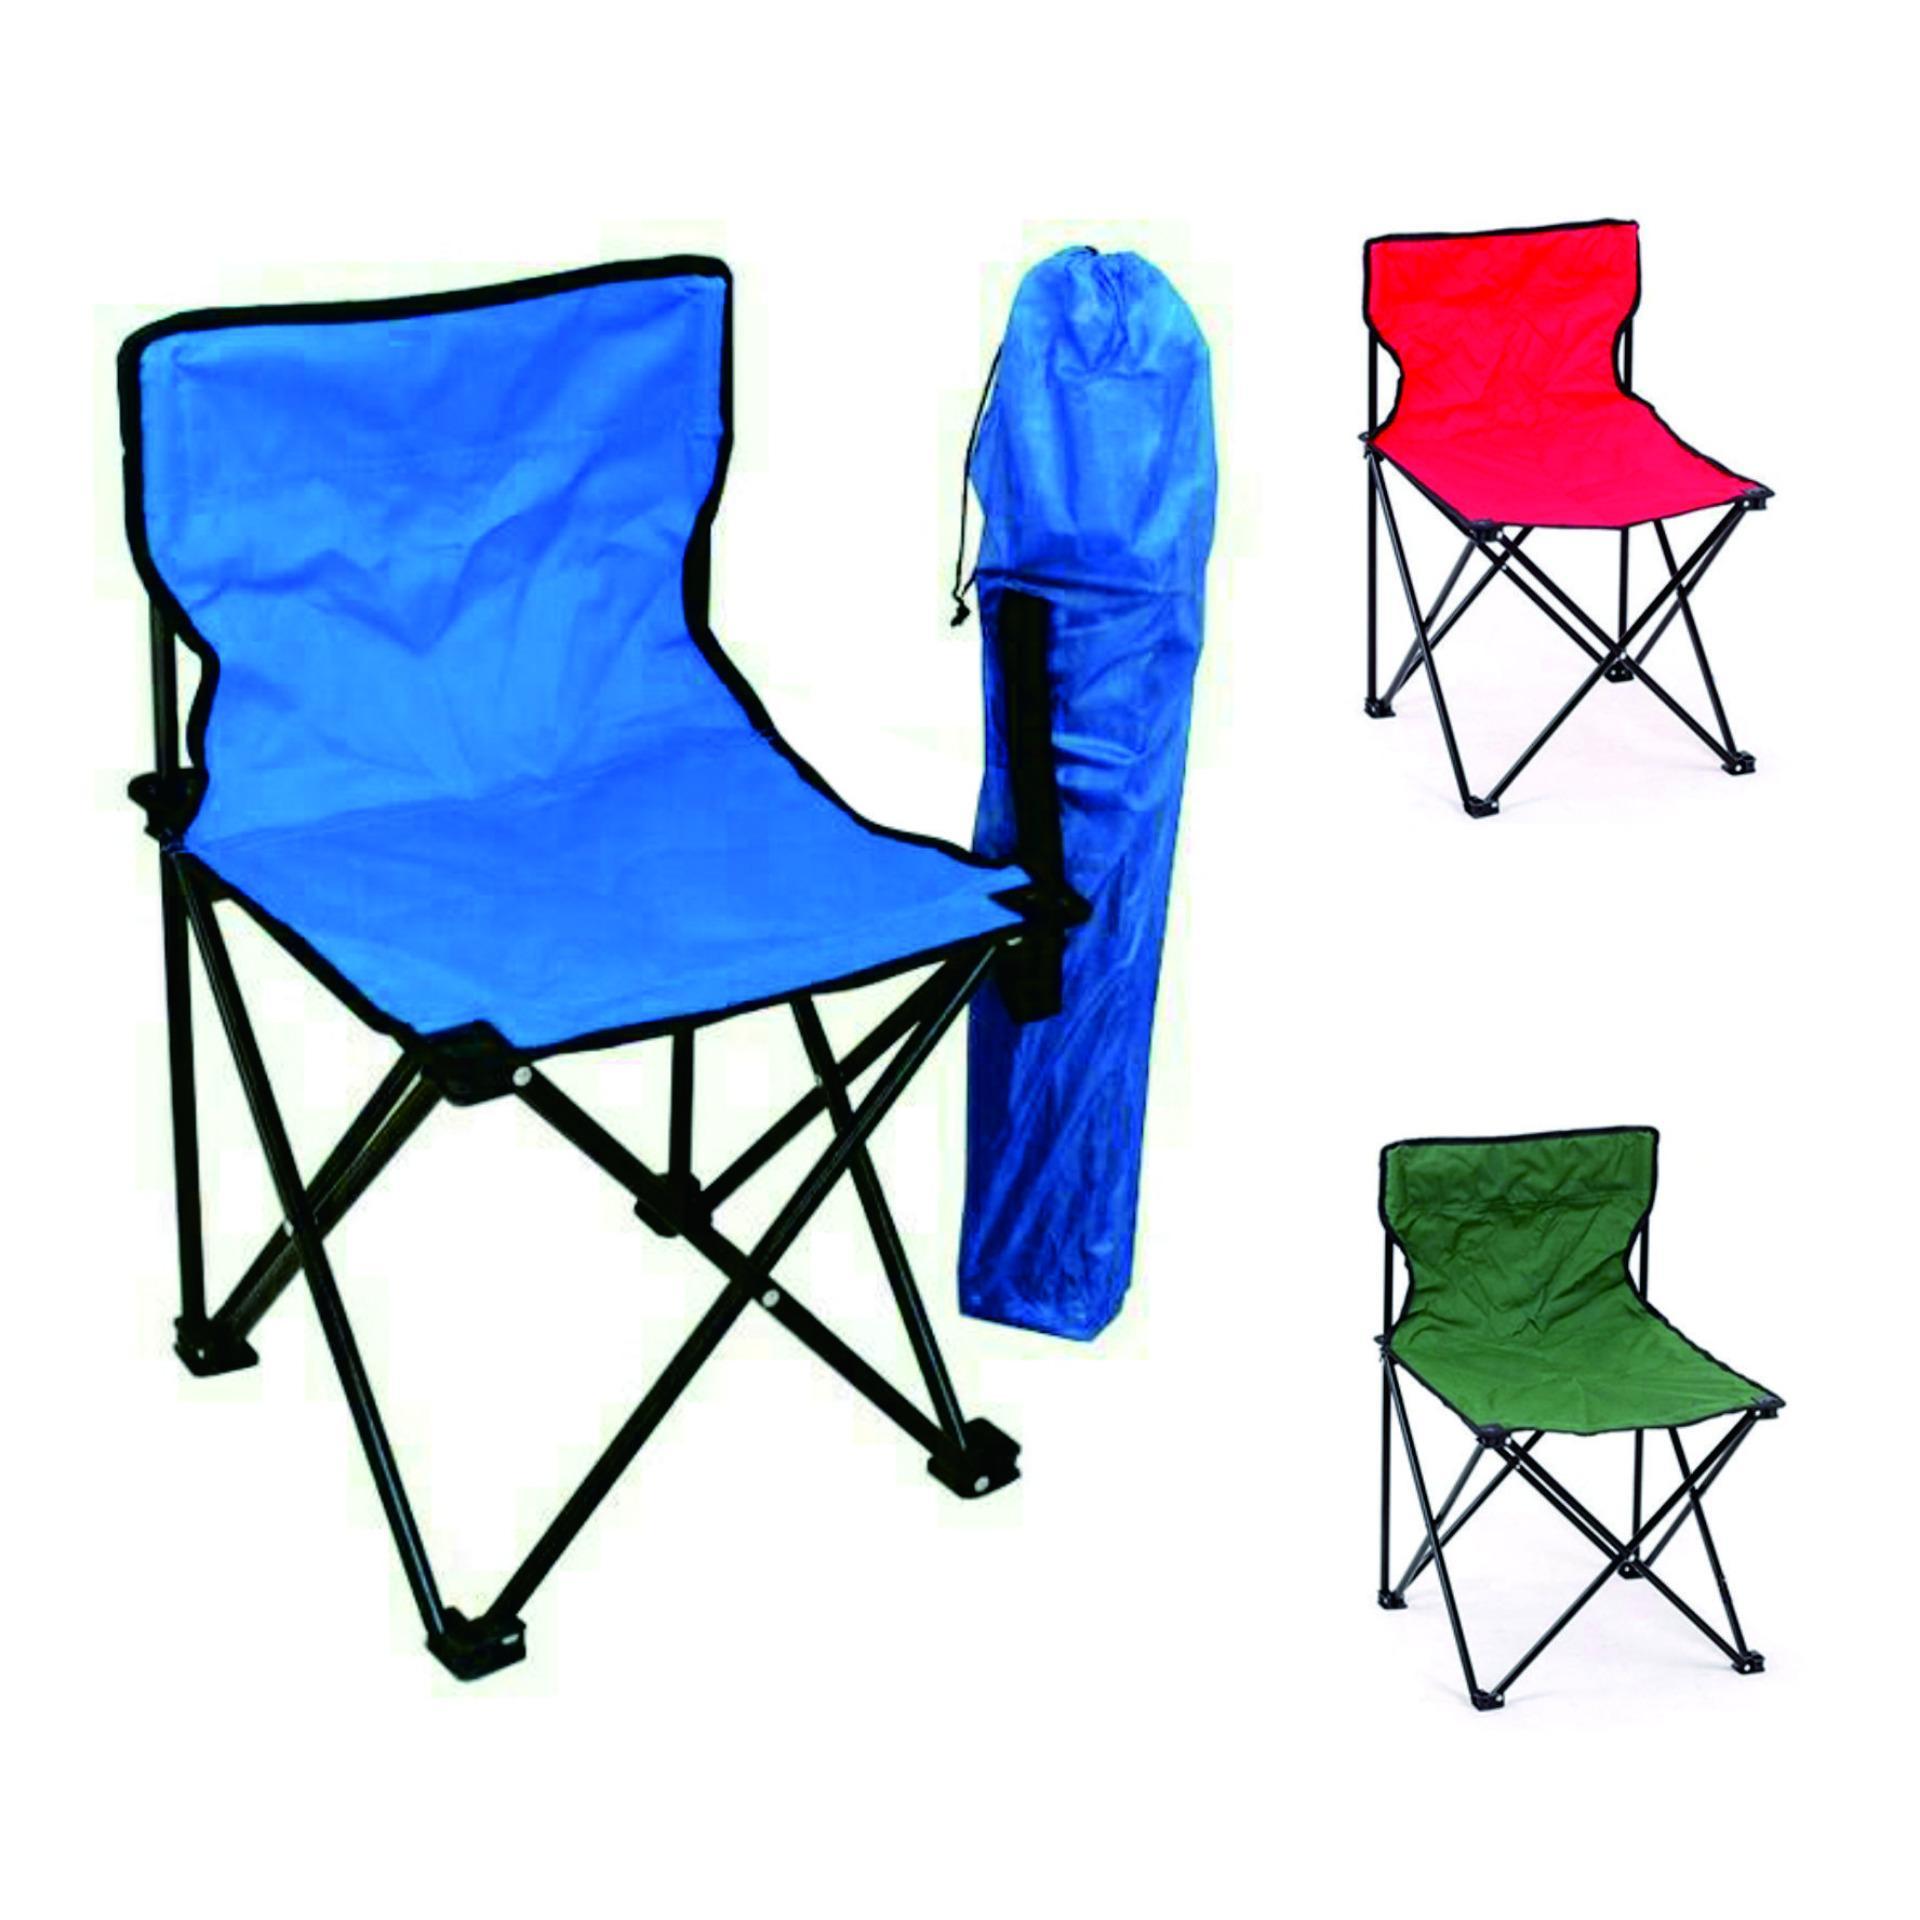 Kursi Lipat Portabel Ringan Kokoh Simpel Praktis Untuk Camping Mancing Pantai Travel Kegiatan Outdoor